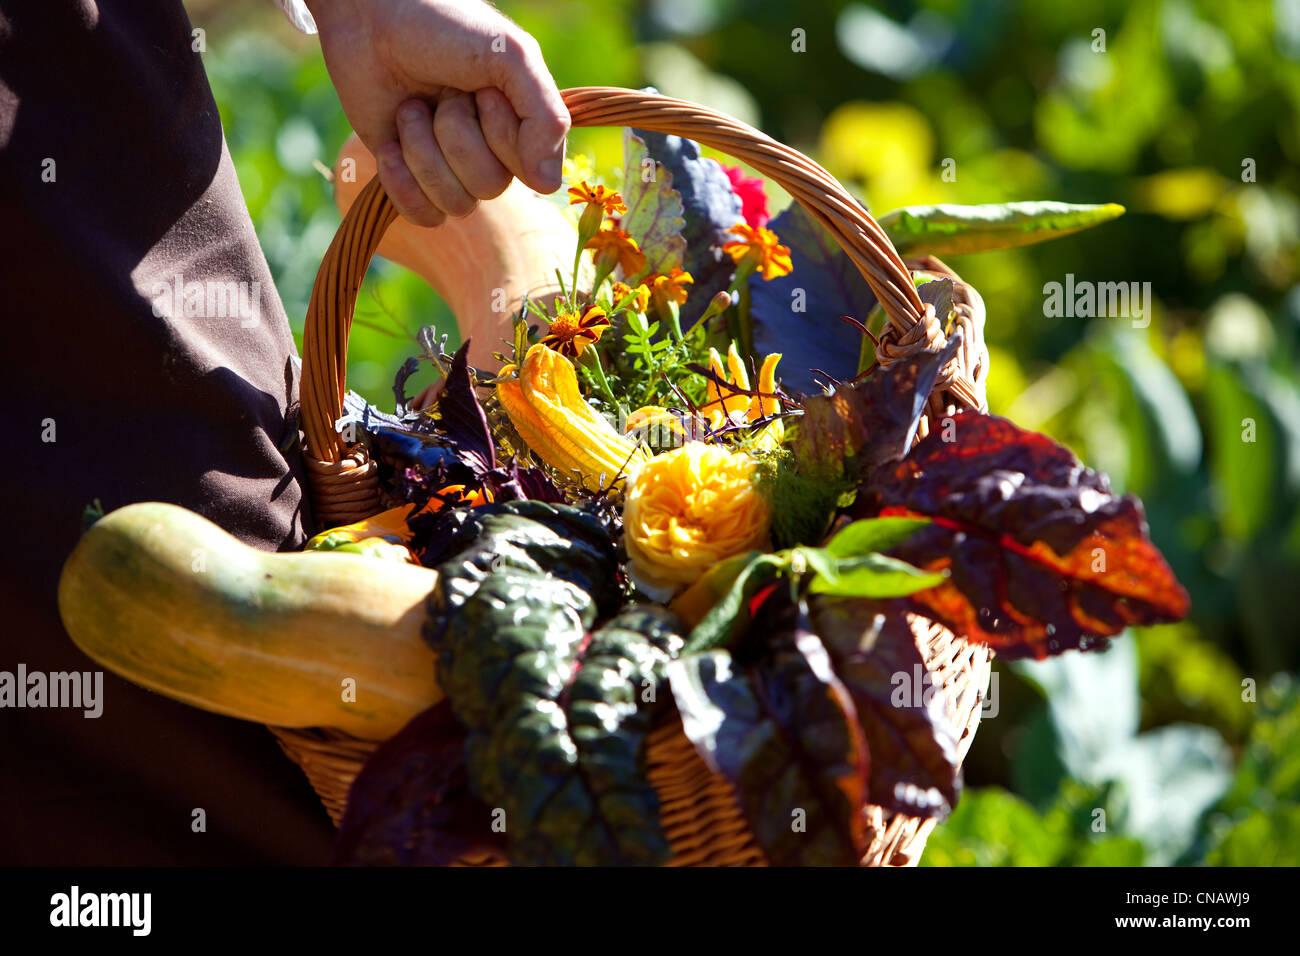 France, Var, Lorgues, Chateau de Berne, compulsory mention, the vegetable garden - Stock Image